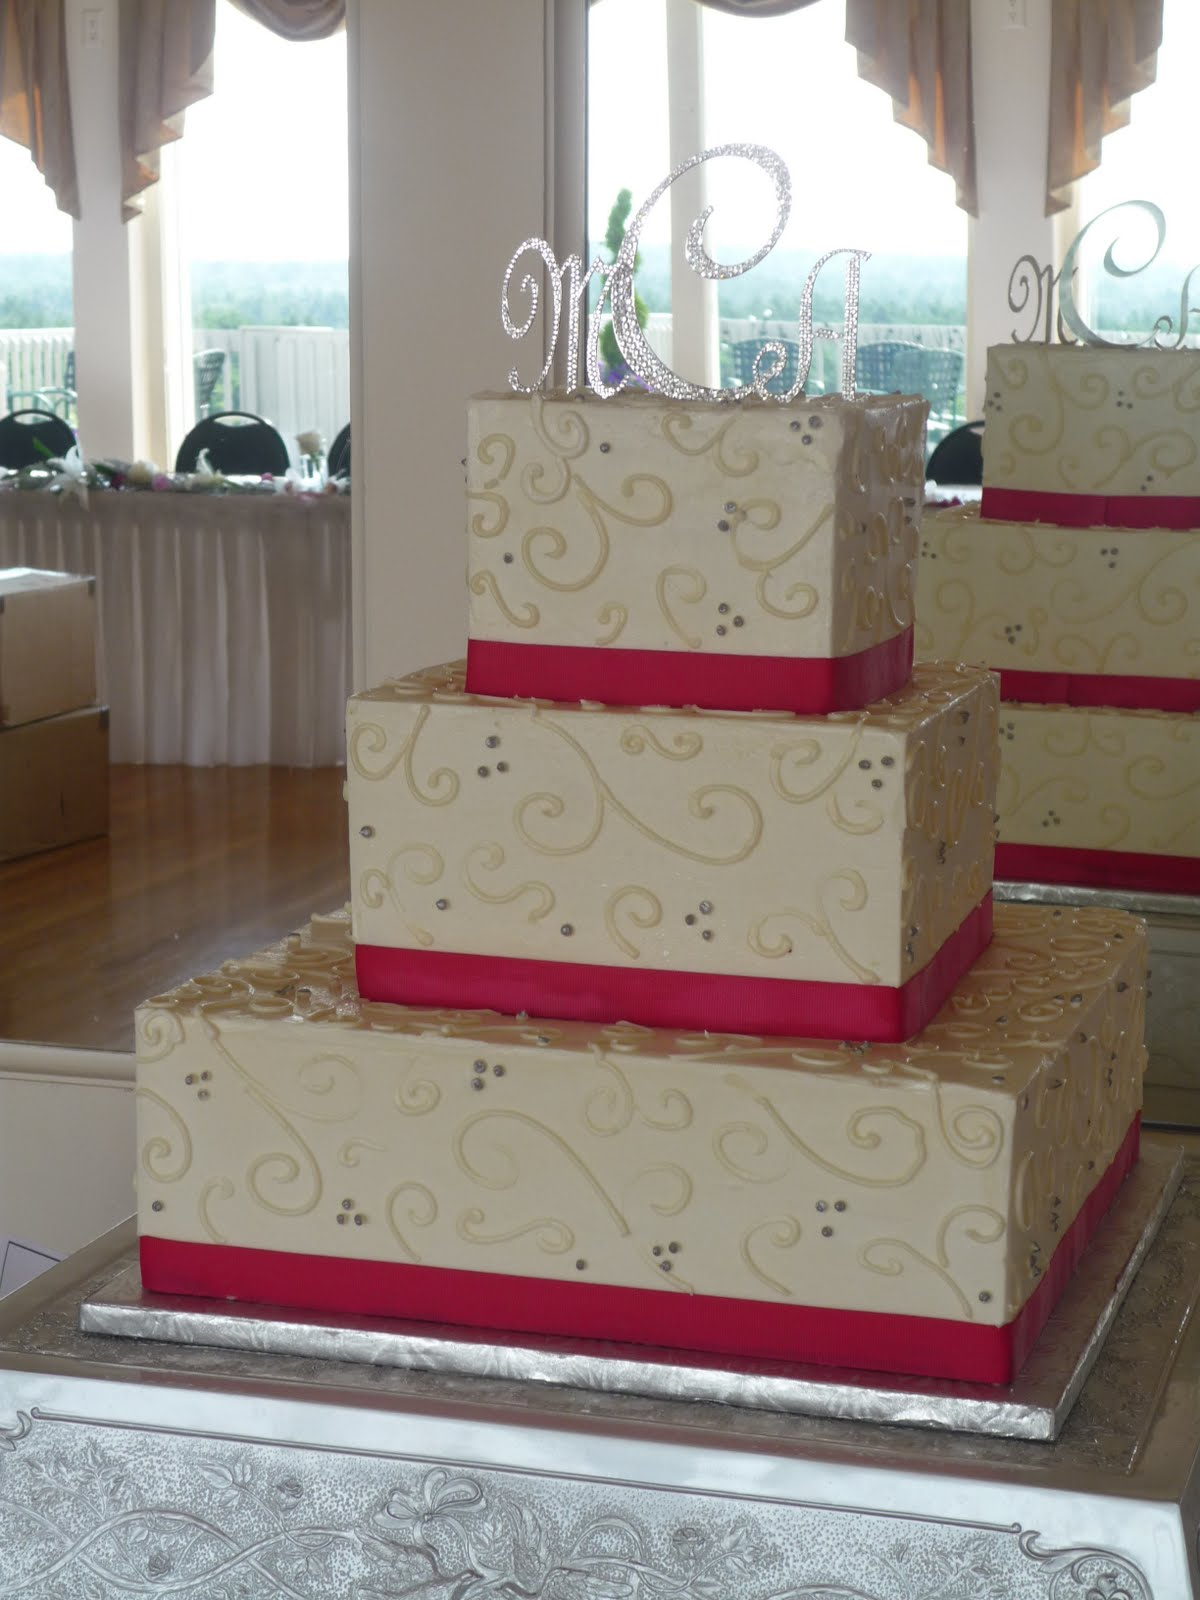 Artisan Bake Shop Wedding Cake Square Buttercream Tiers